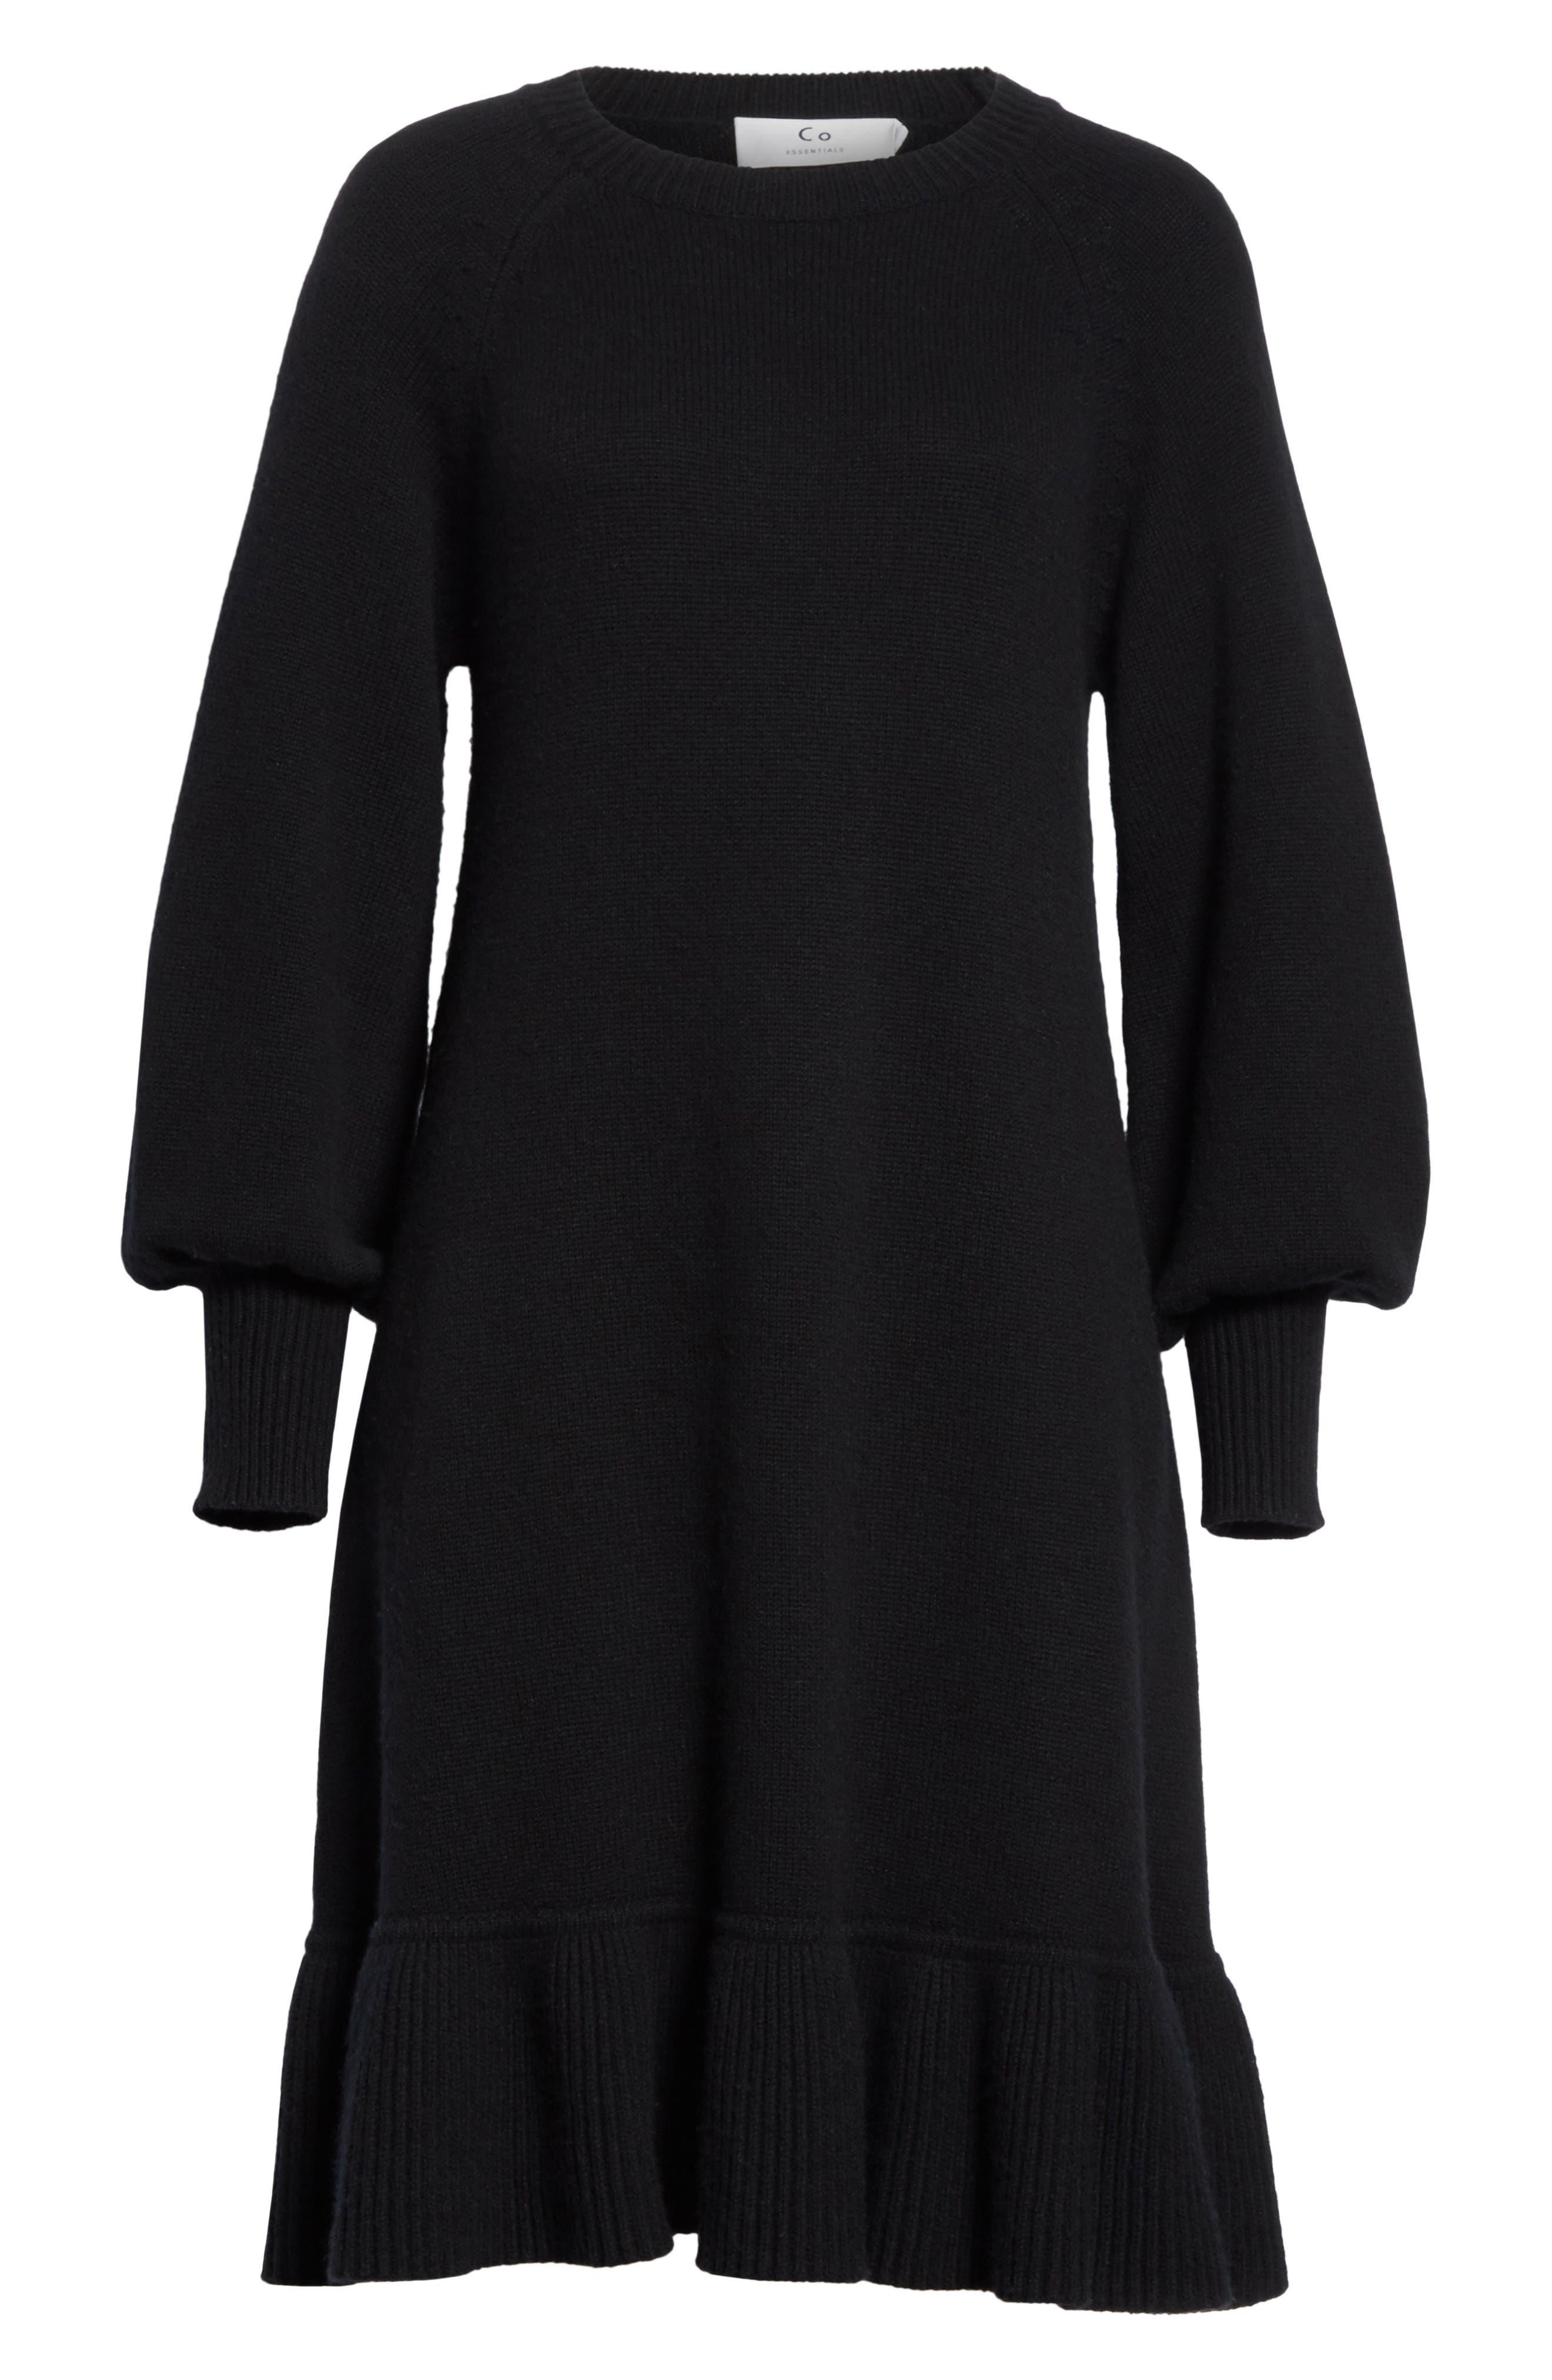 Ruffle Wool & Cashmere Sweater Dress,                             Alternate thumbnail 6, color,